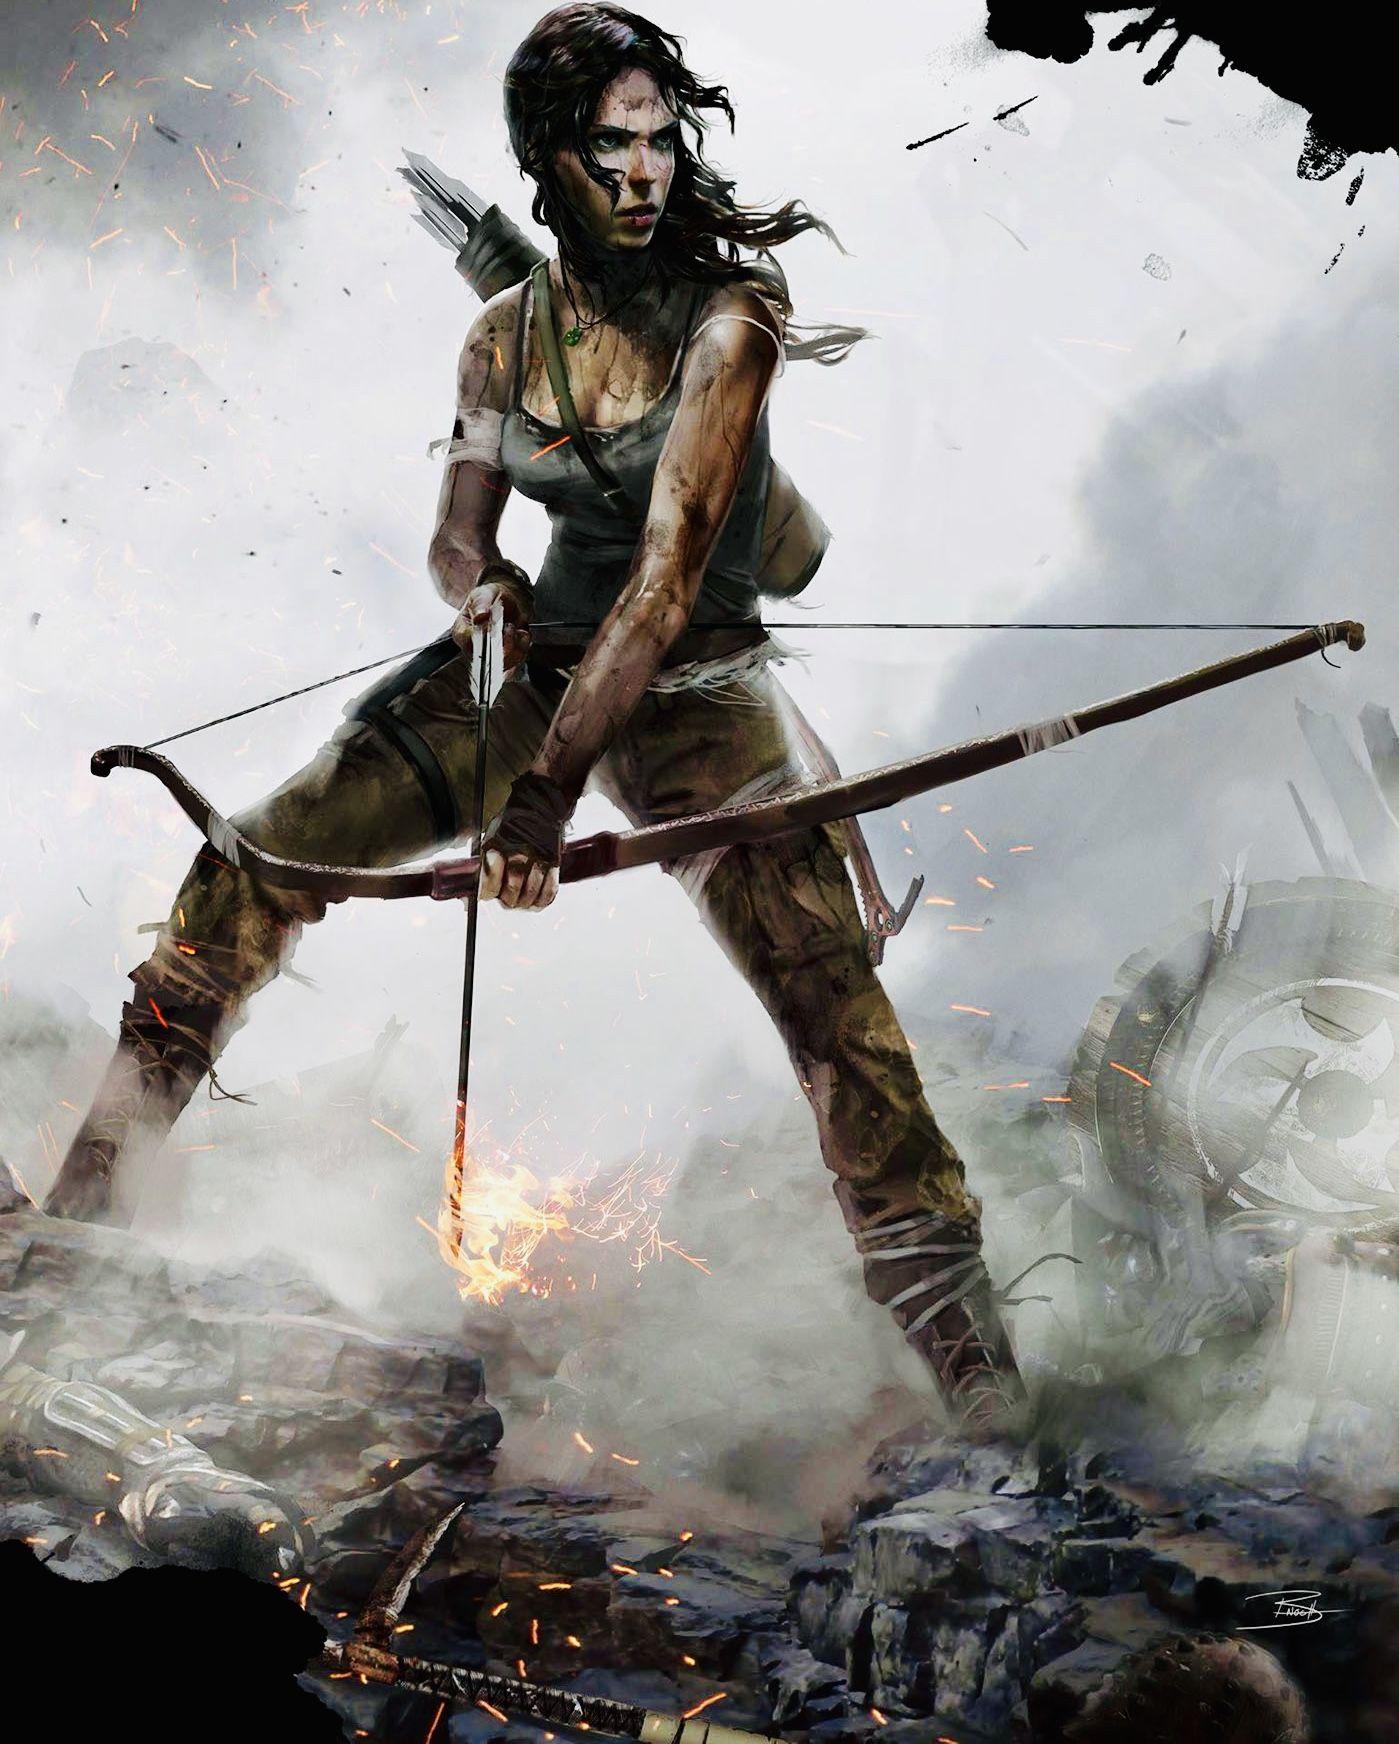 Lara Croft Tomb Raider With Images Tomb Raider Lara Croft